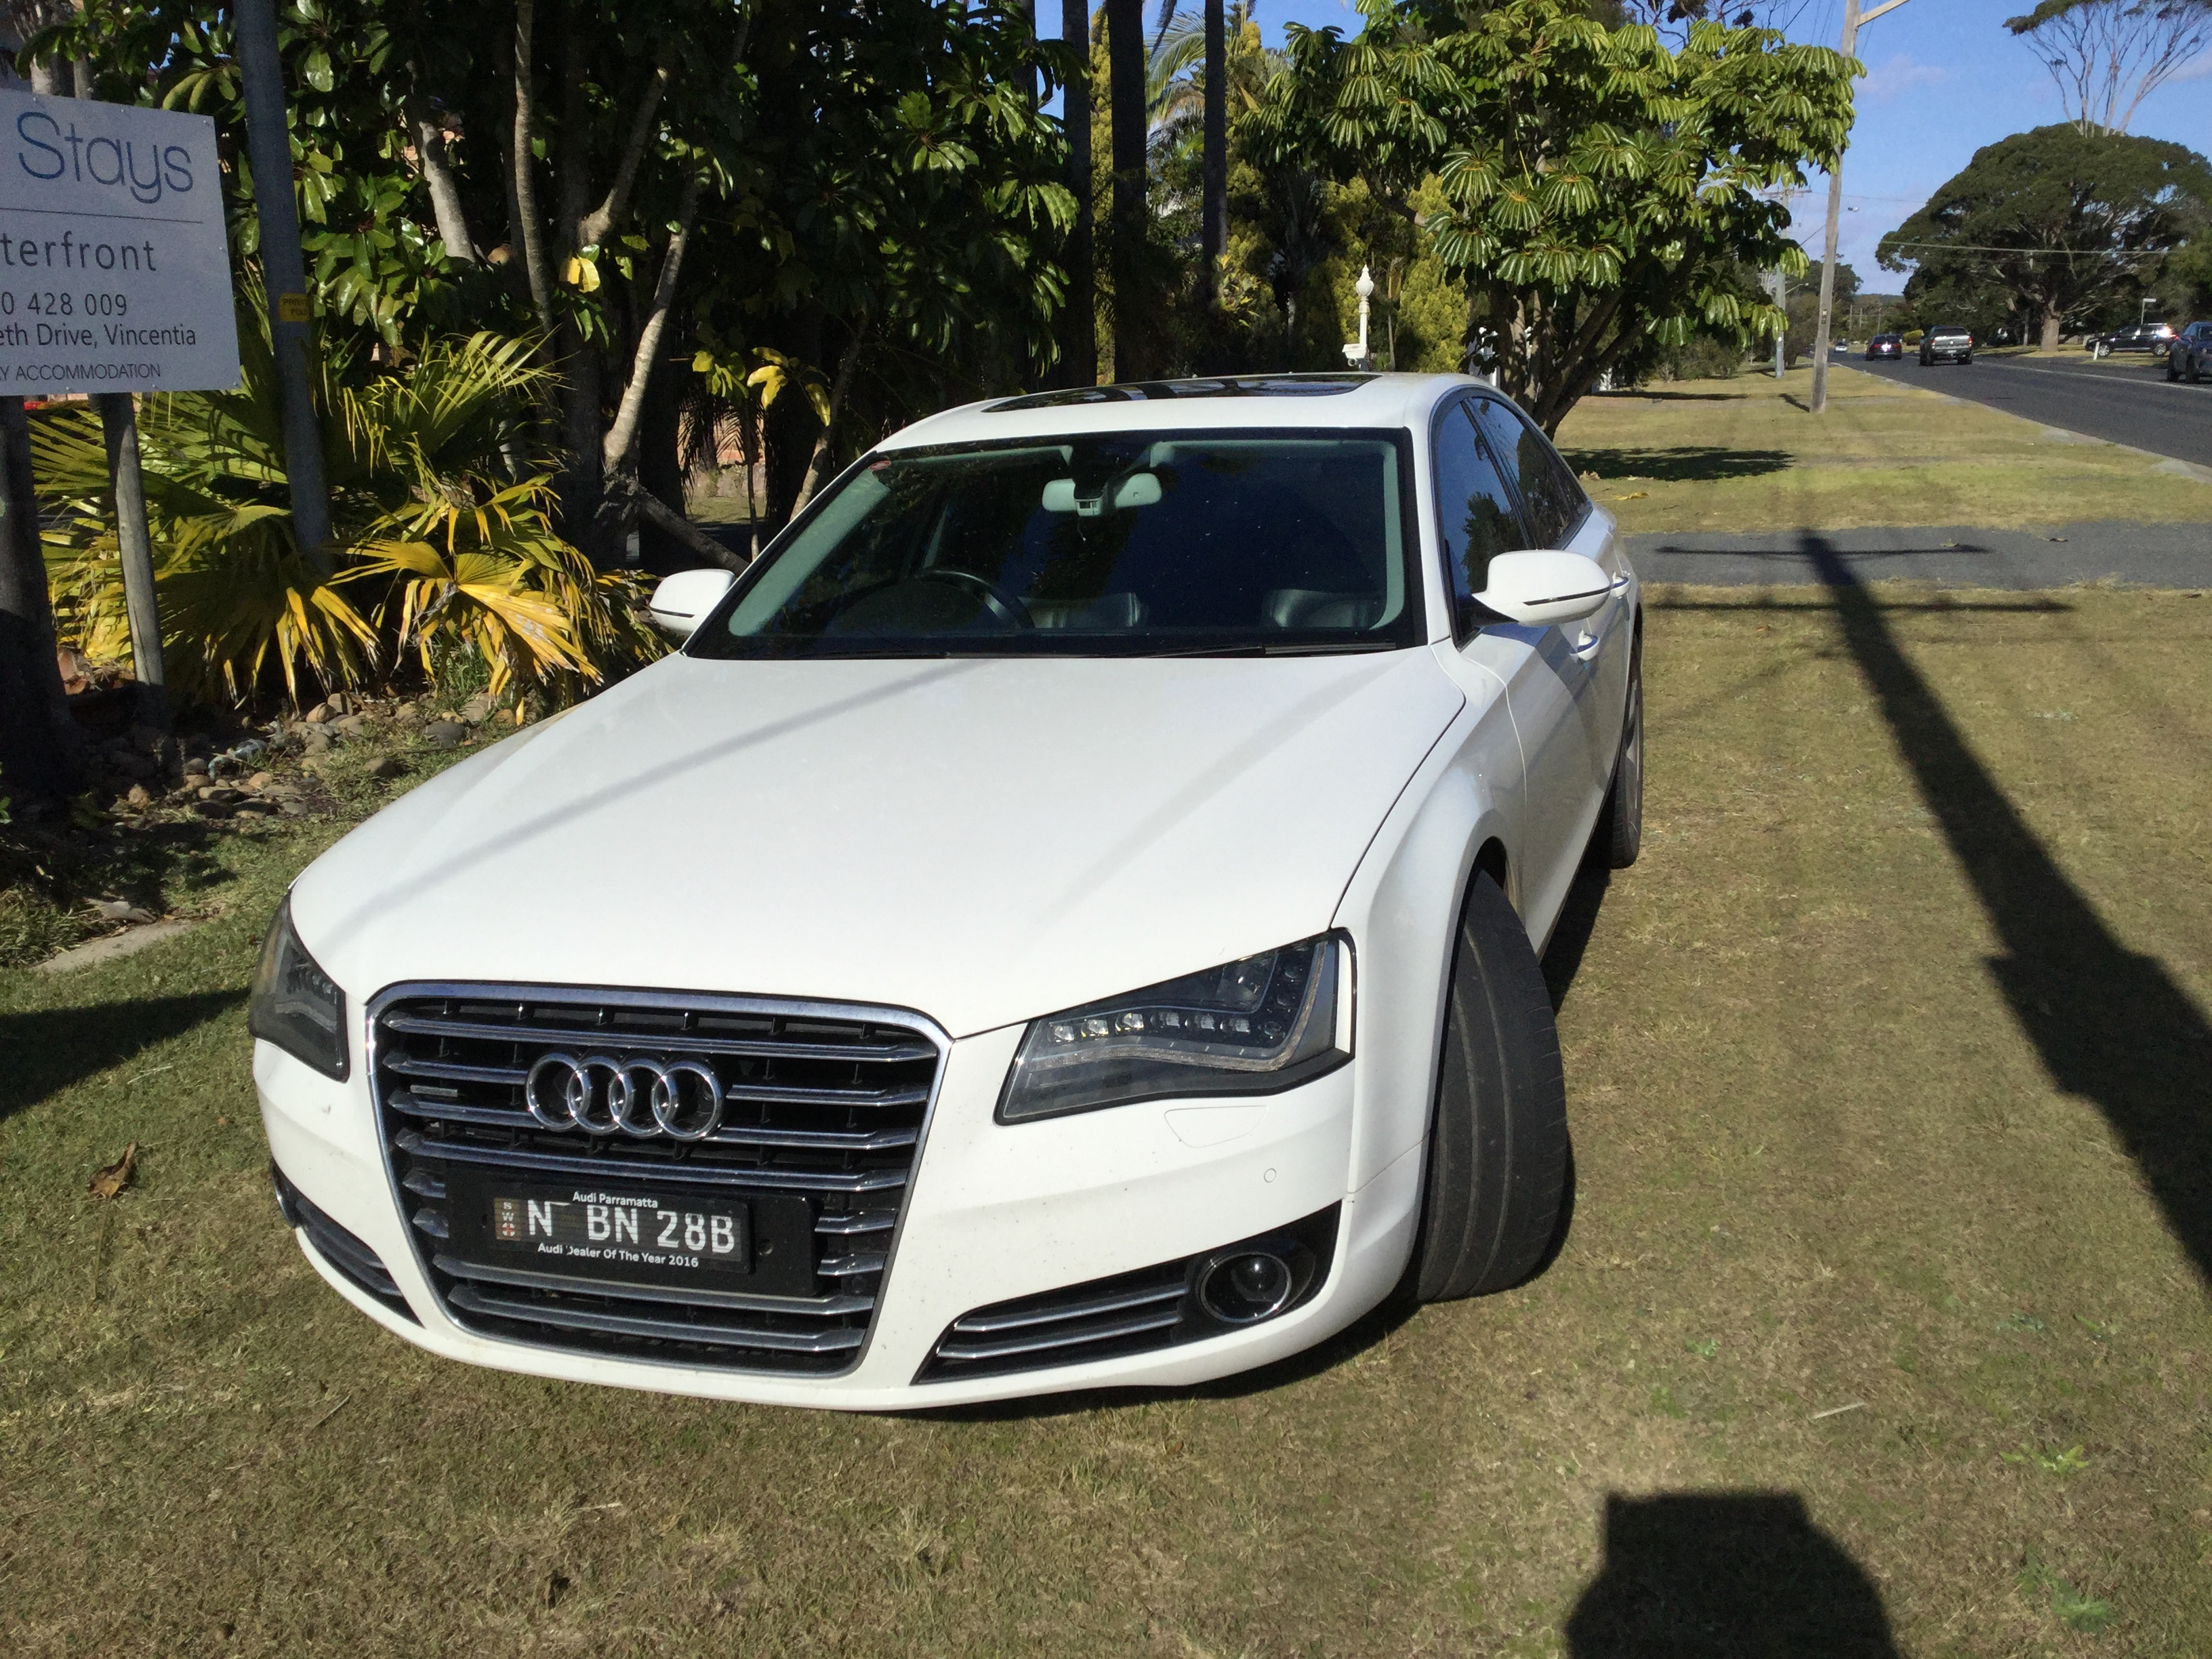 Kekurangan Audi A8 4.2 V8 Harga